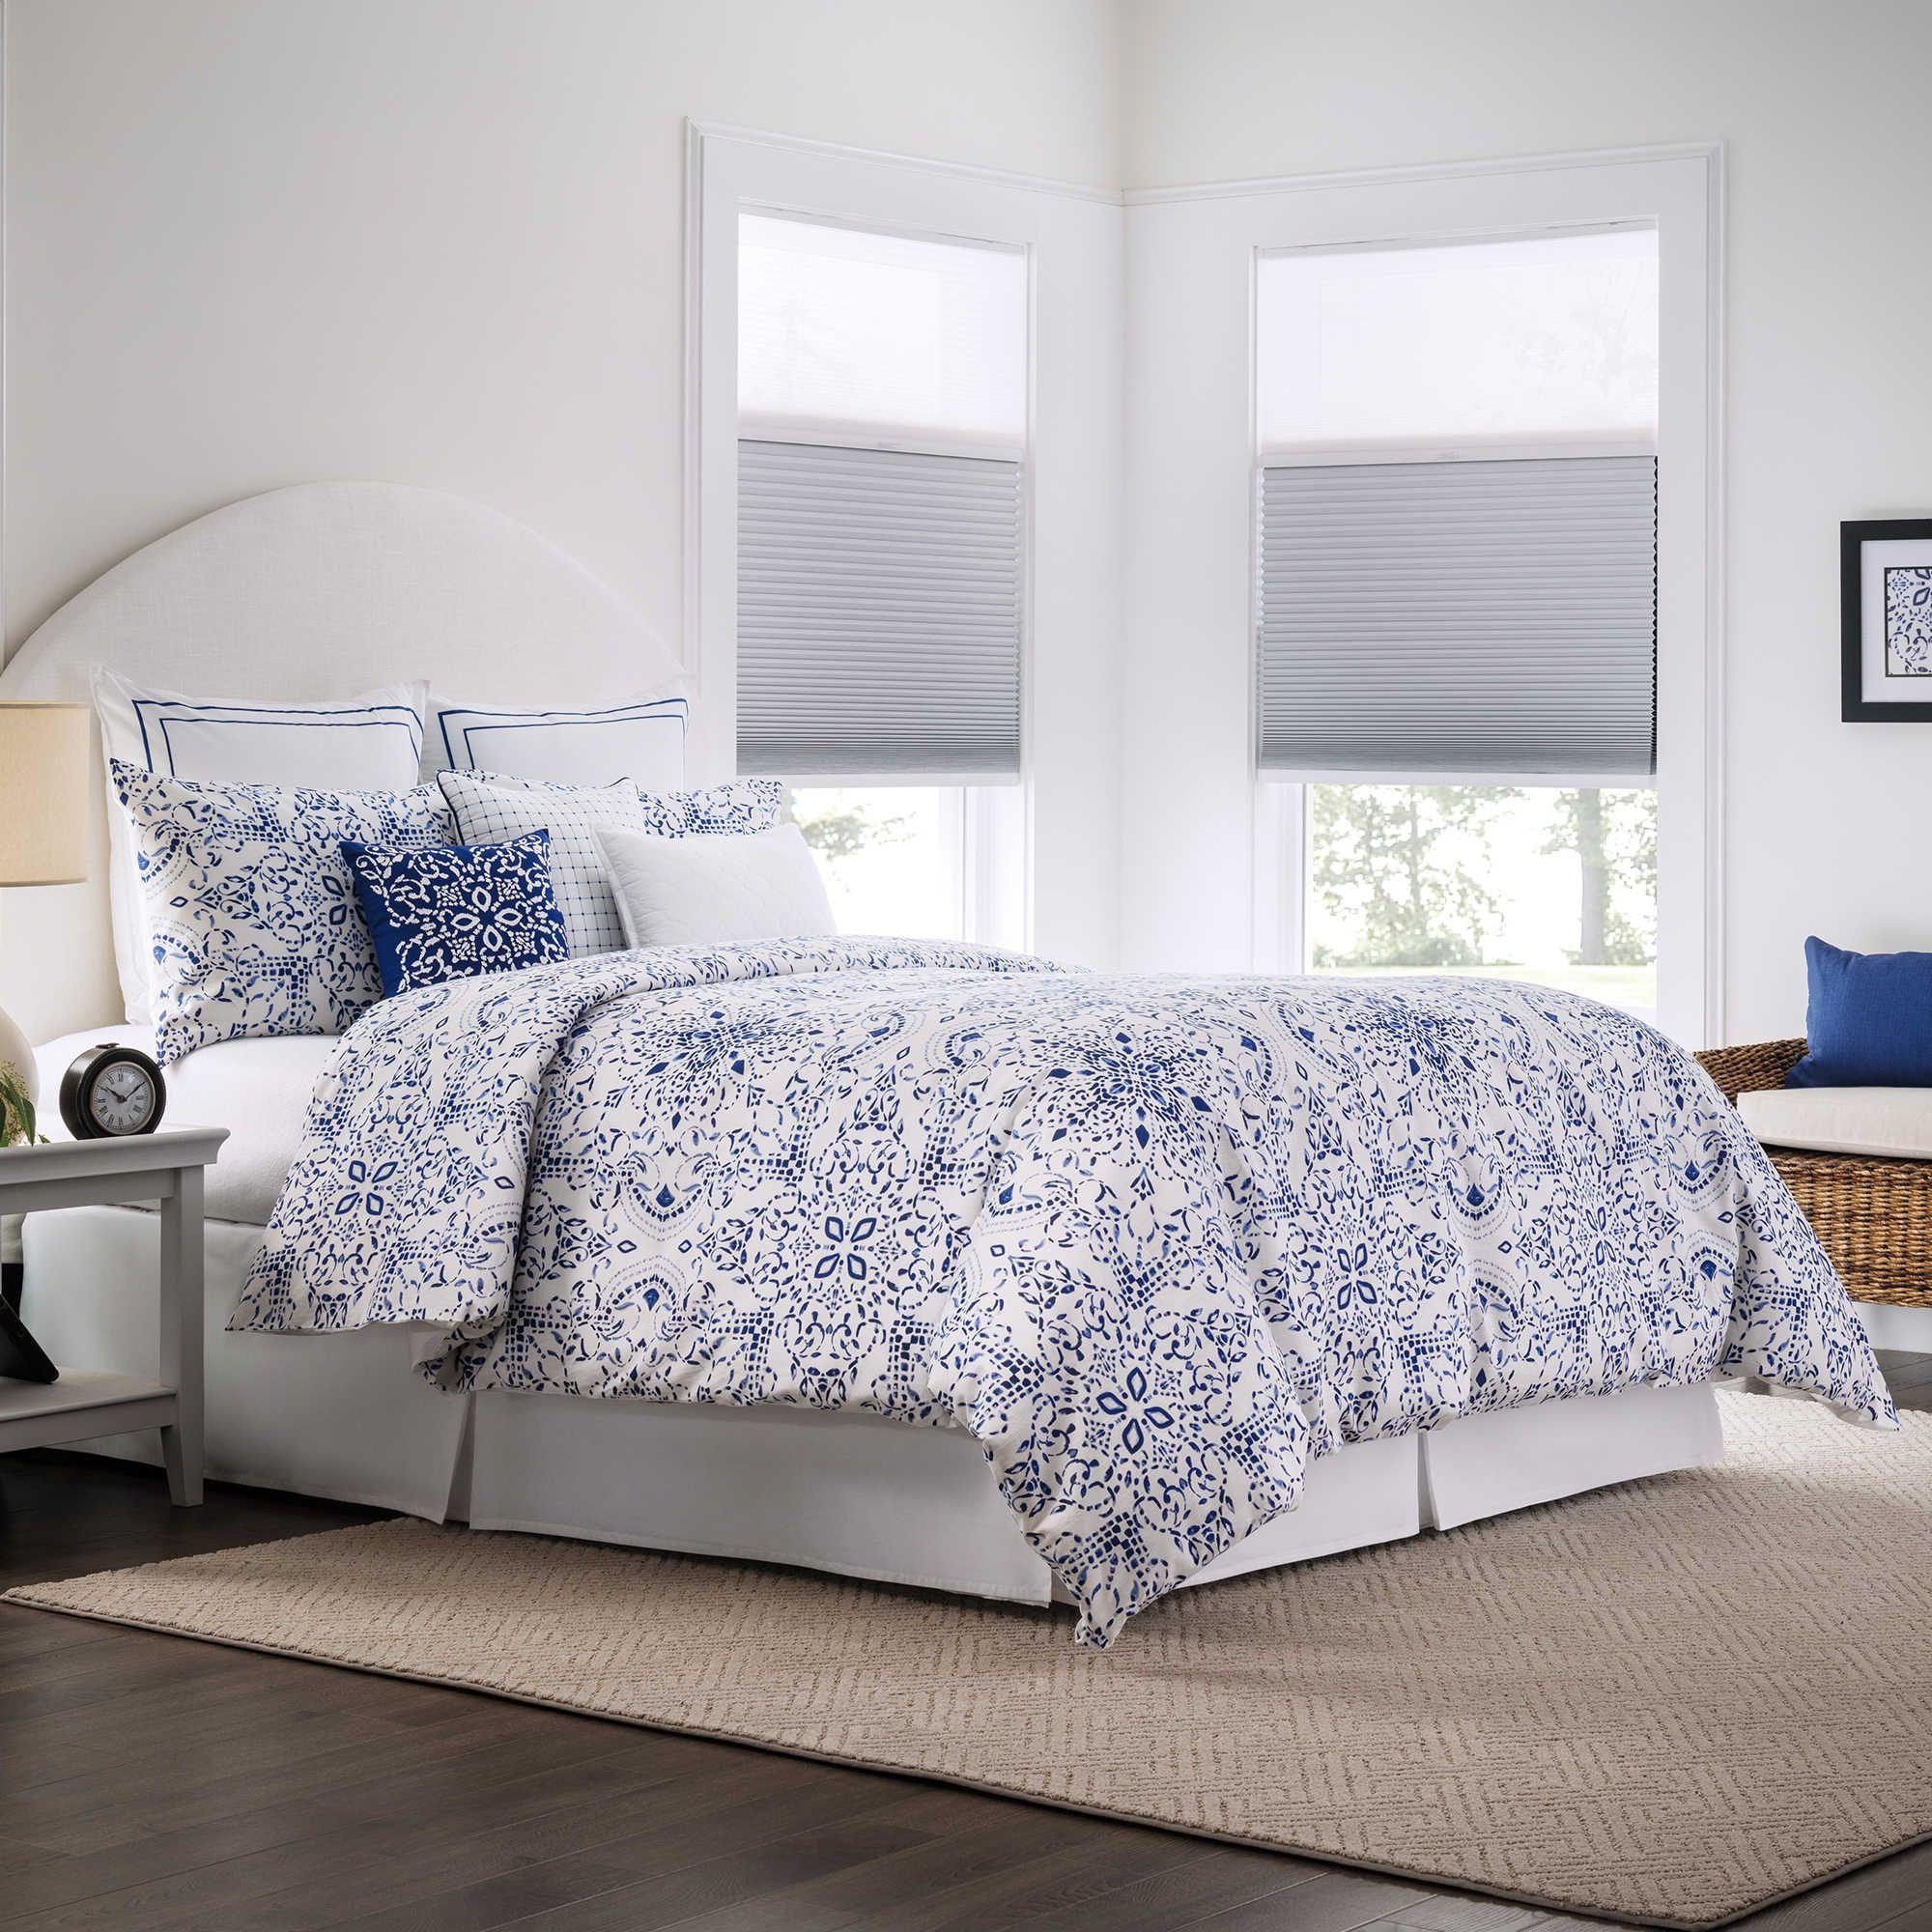 Bedroom Ideas Real Simple real simple lisbon reversible duvet cover set - bedbathandbeyond